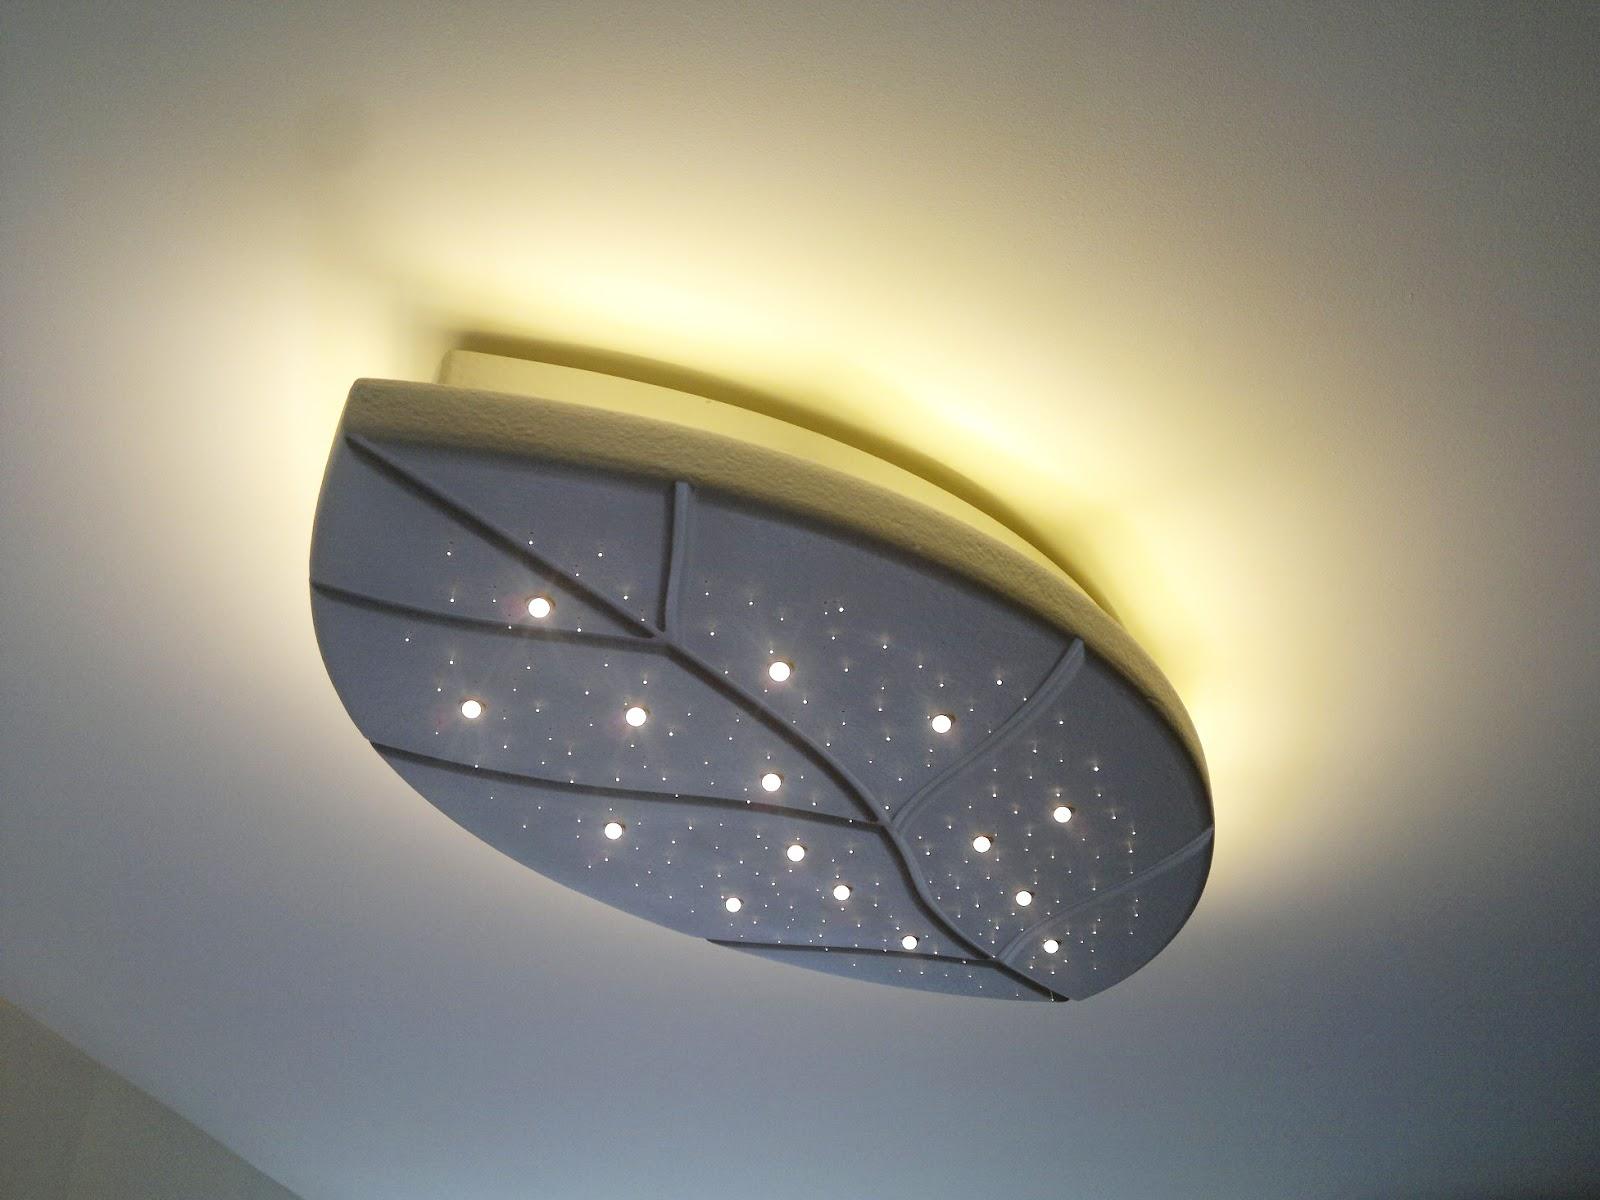 Illuminazione salone a led: illuminazione led casa: aprile 2016 ...